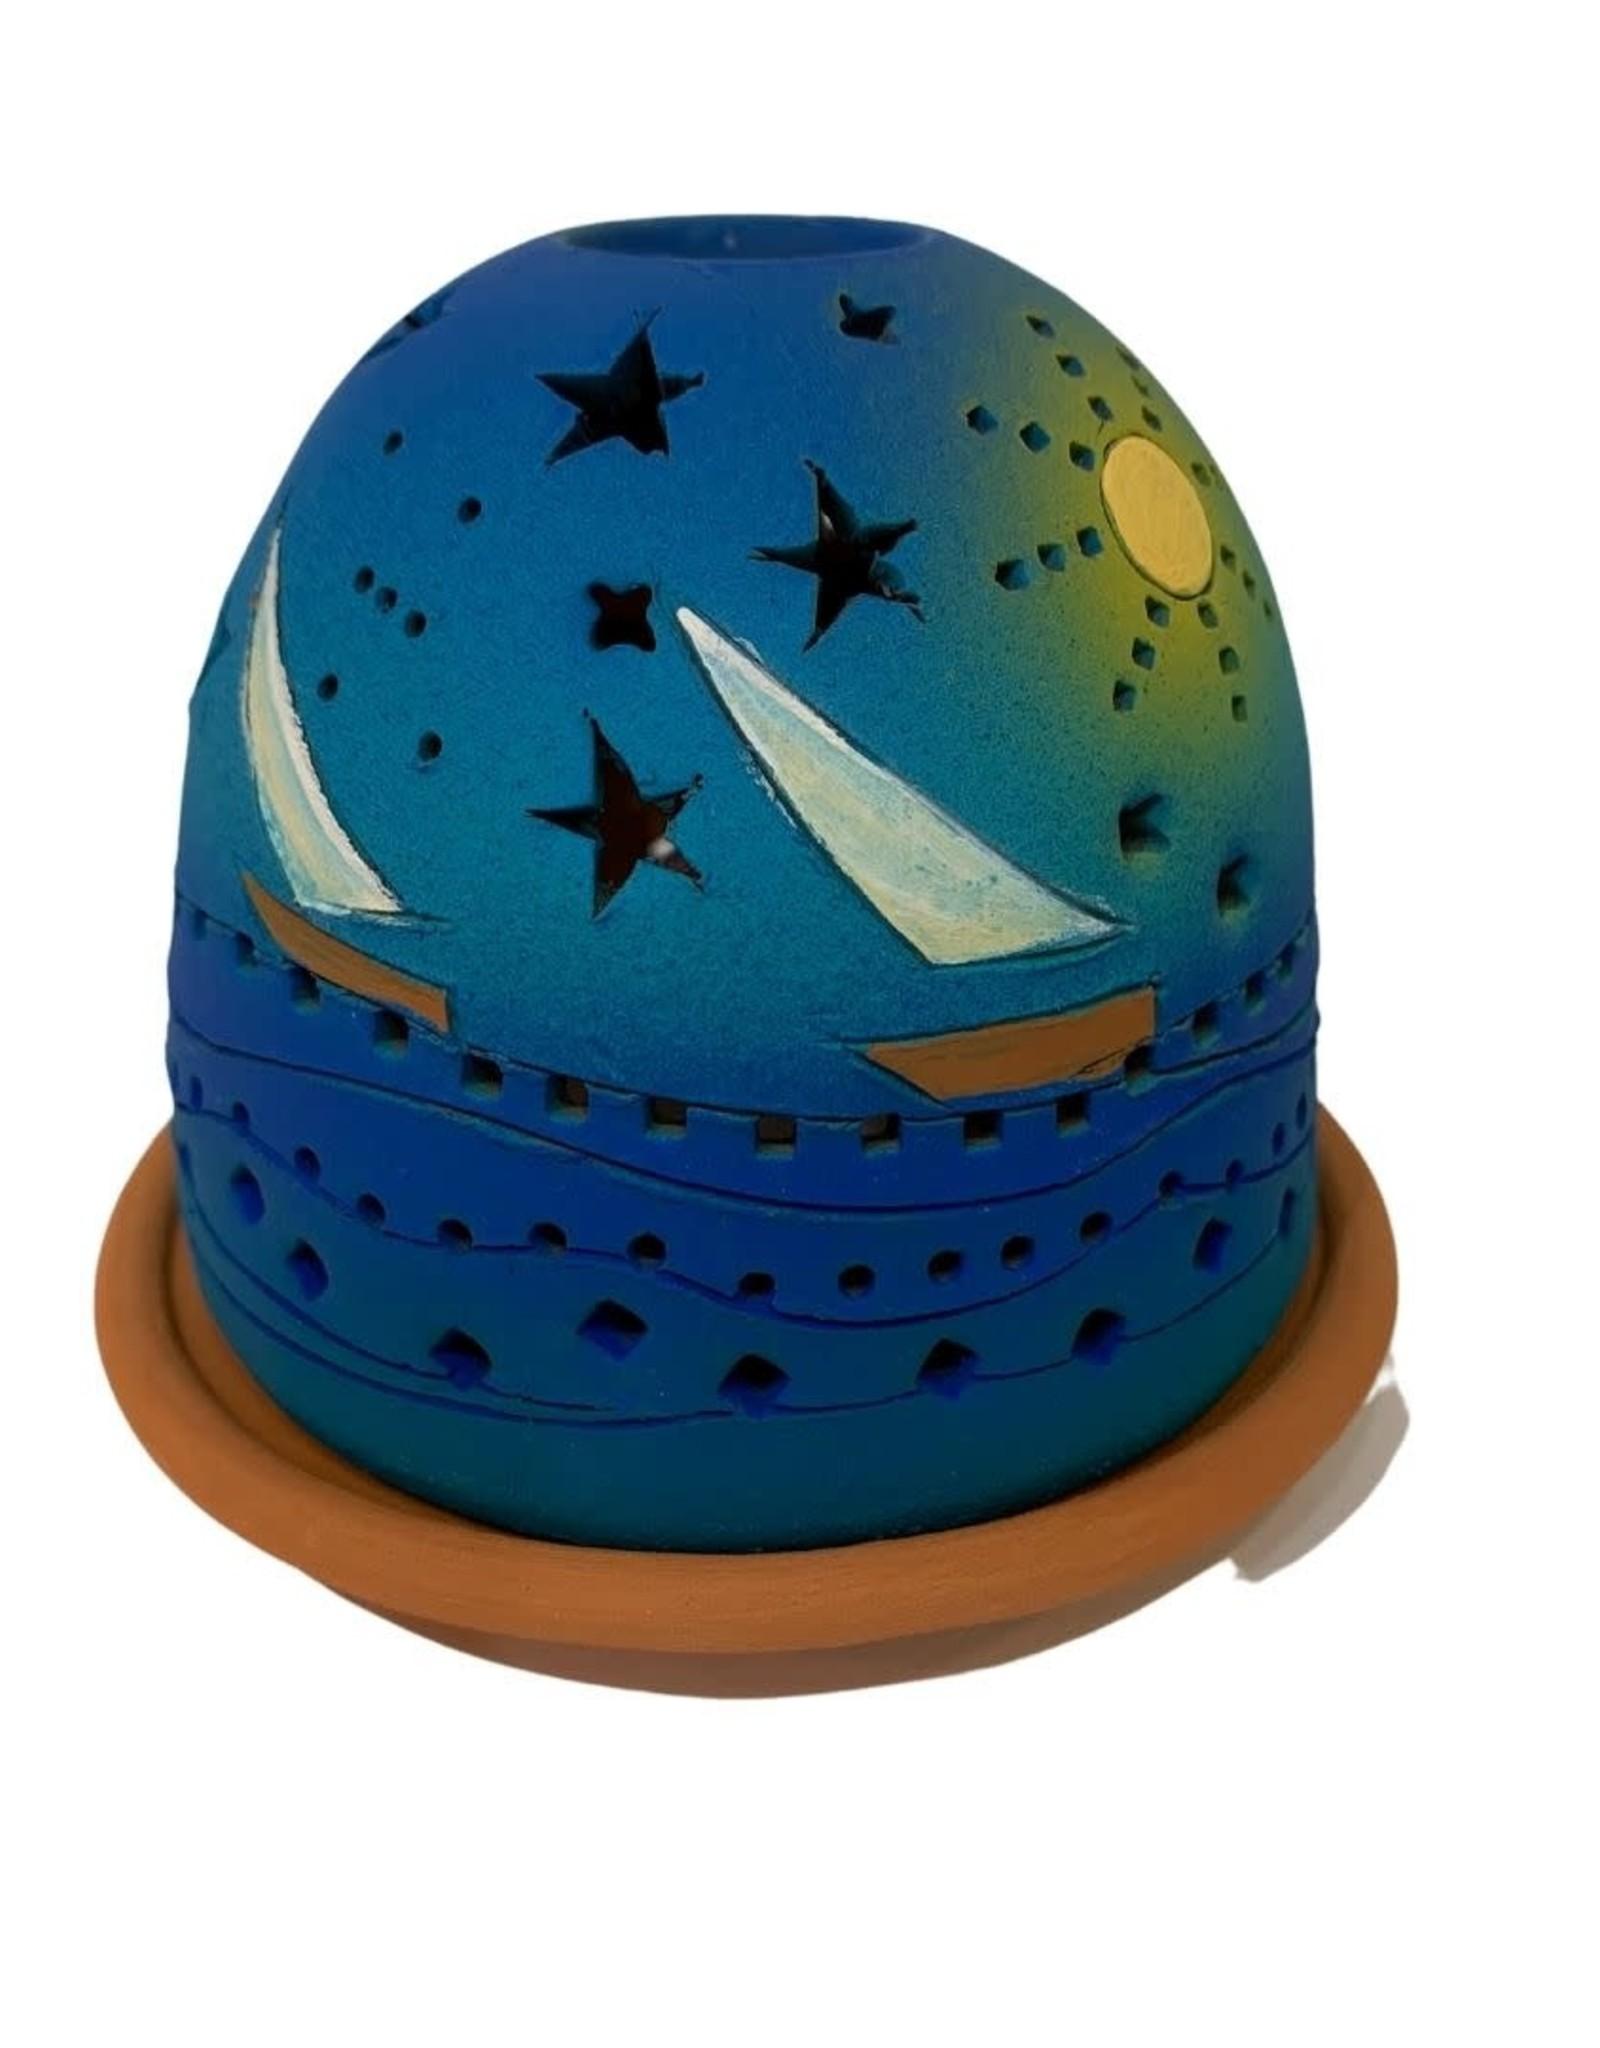 Starry Lights Ceramic Luminary